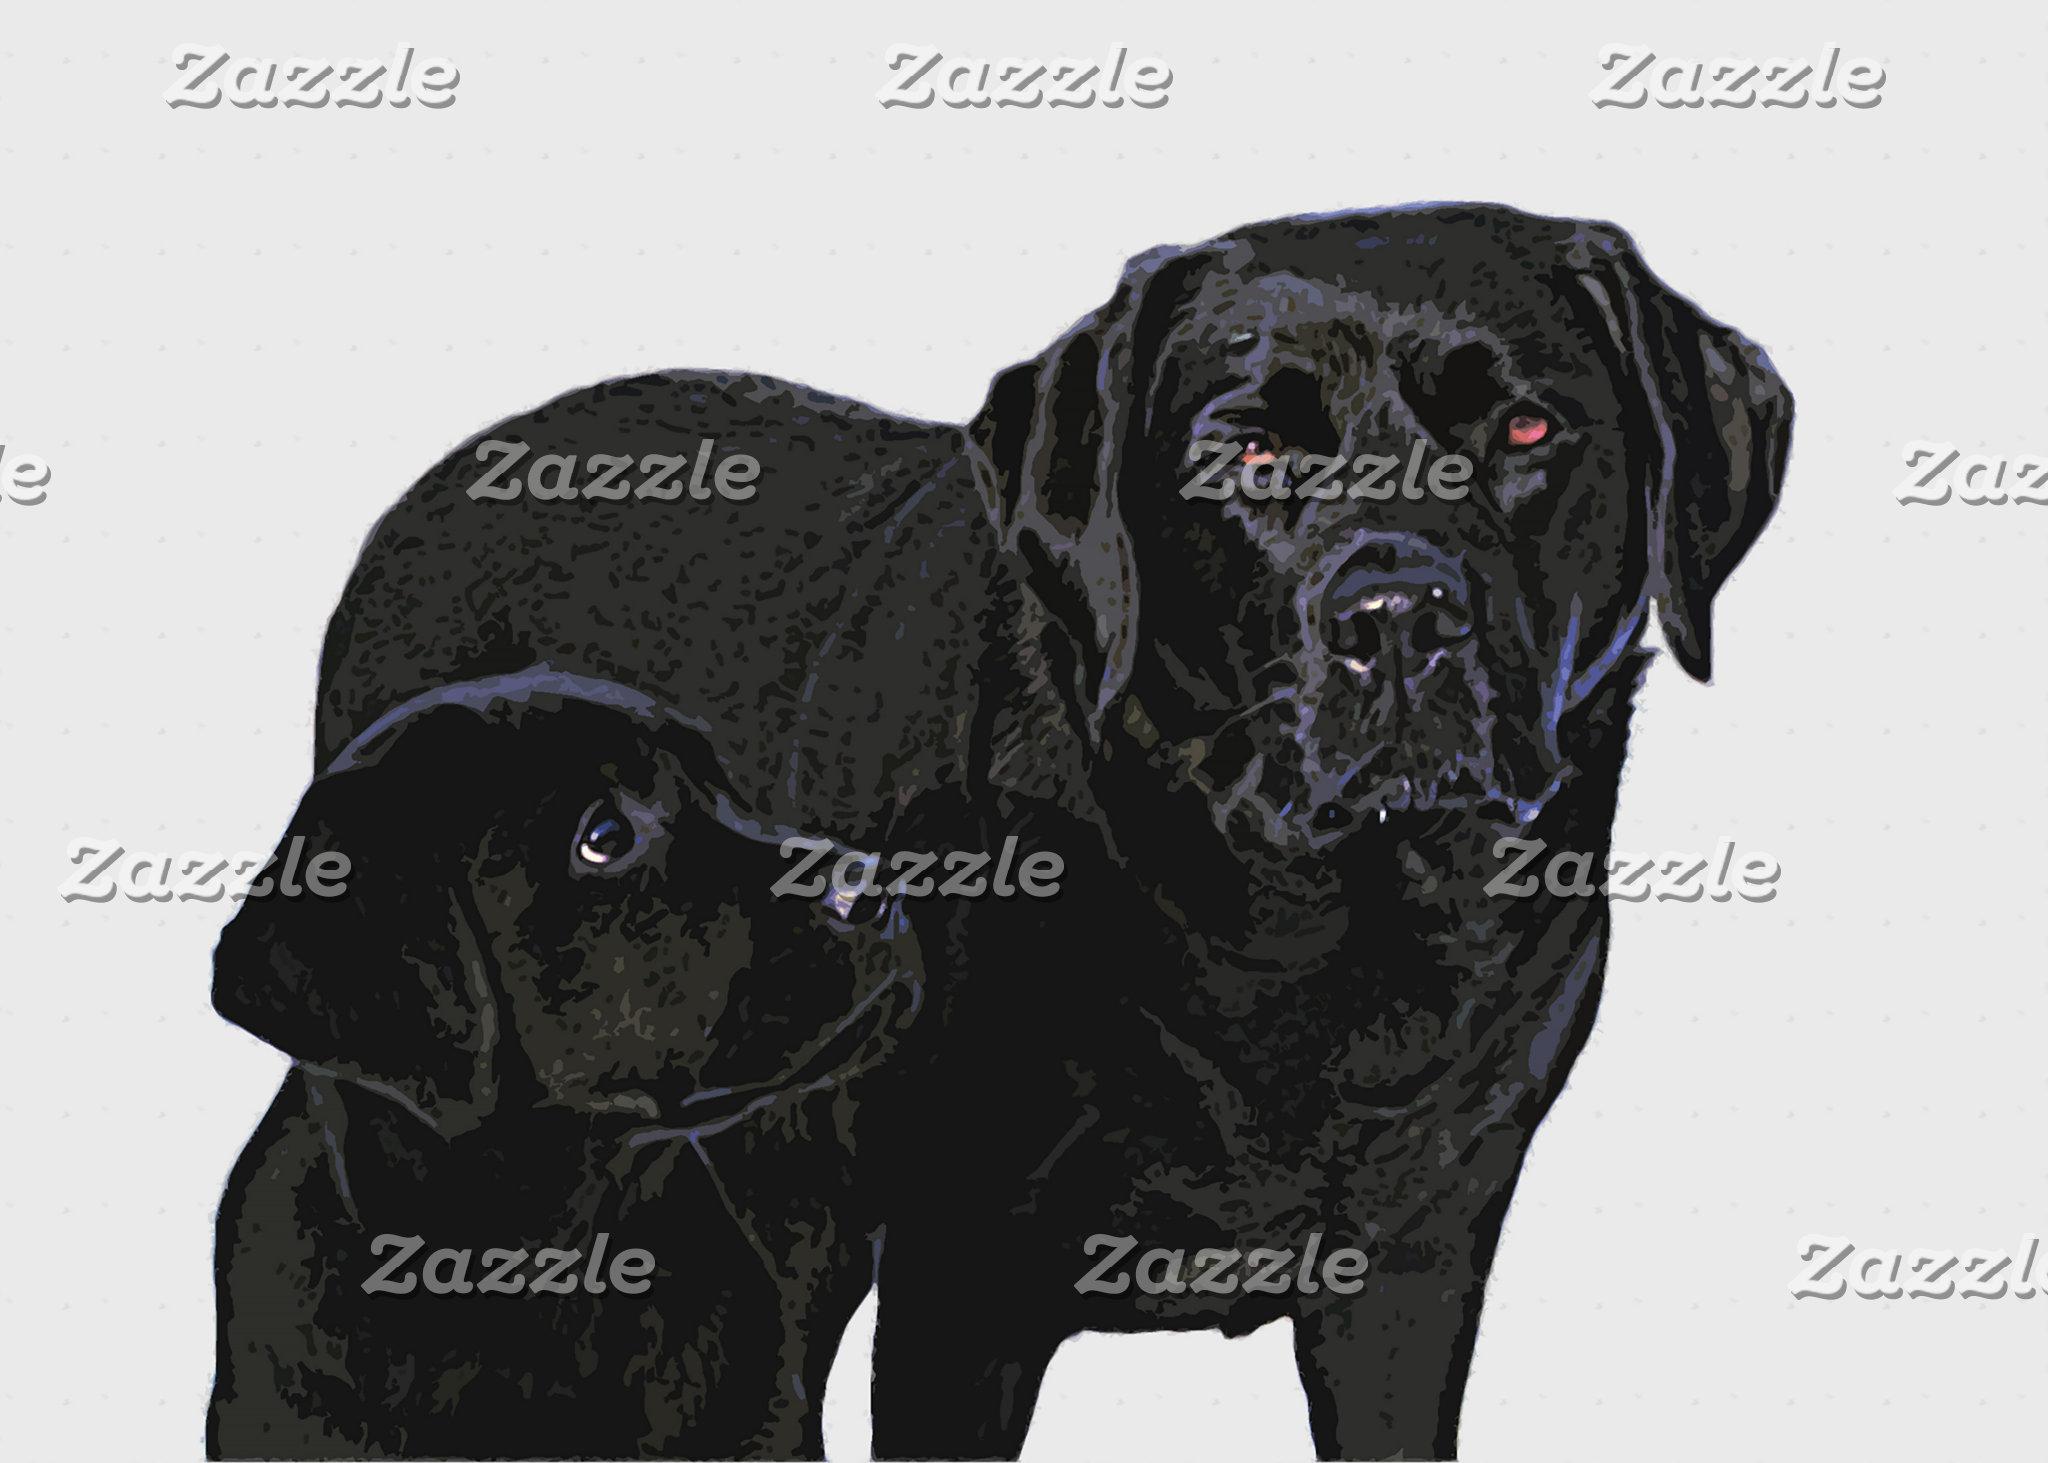 Black Labrador - Admiration in Puppy's Eye's